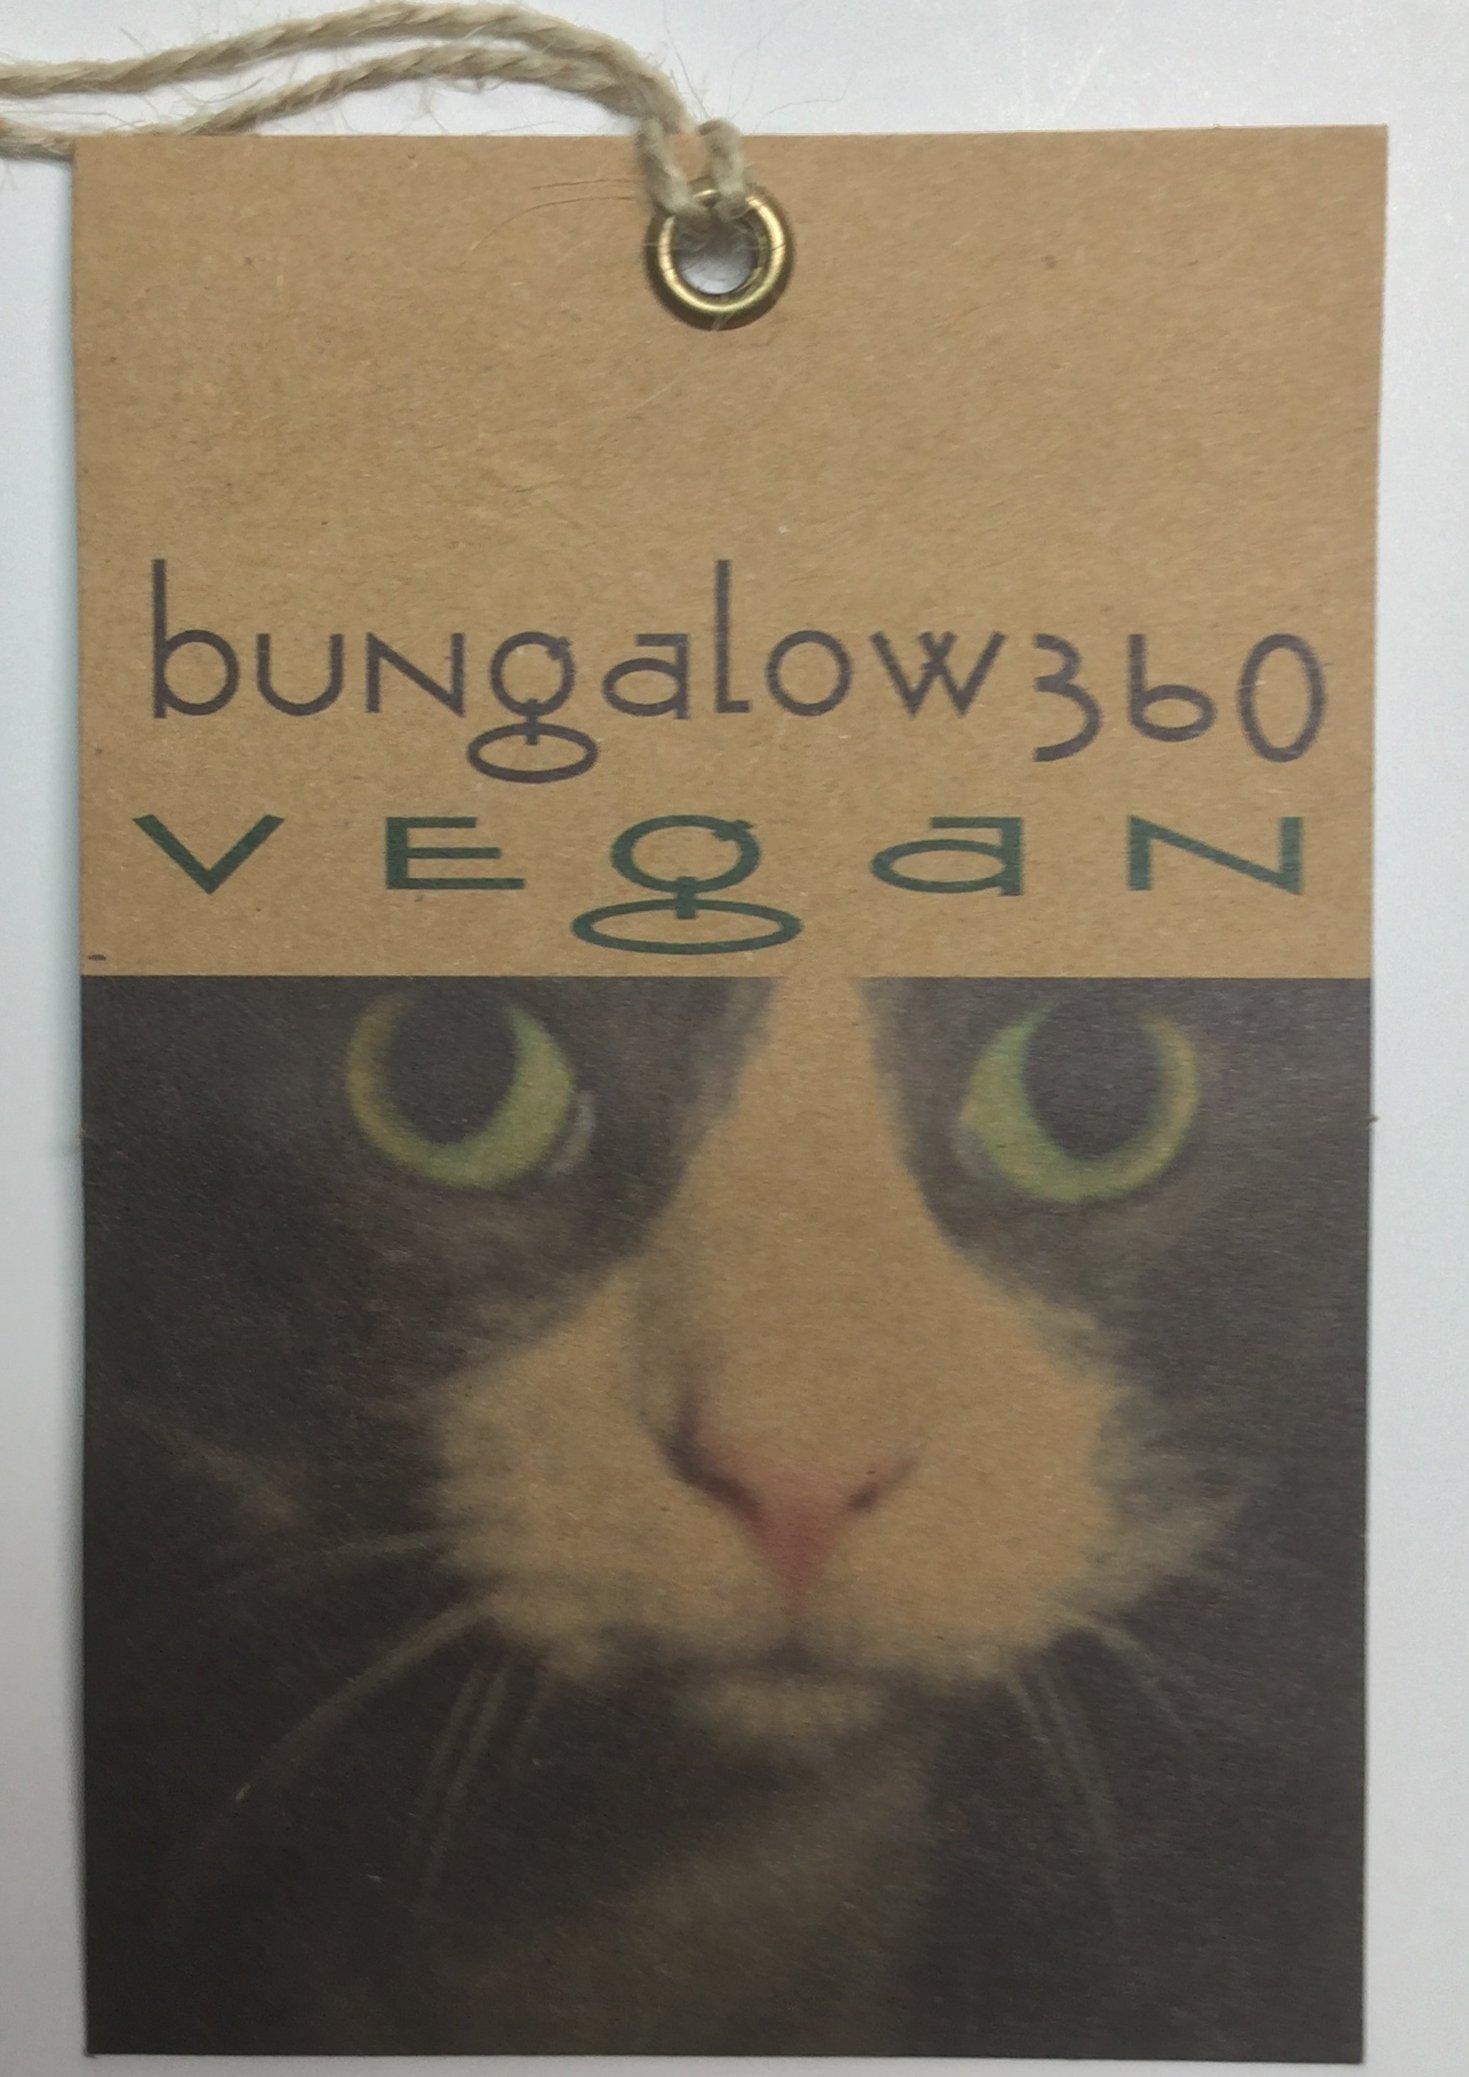 Bungalow 360 Original Vegan Leather Striped Hobo Bag (Nutmeg) by bungalow 360 (Image #6)